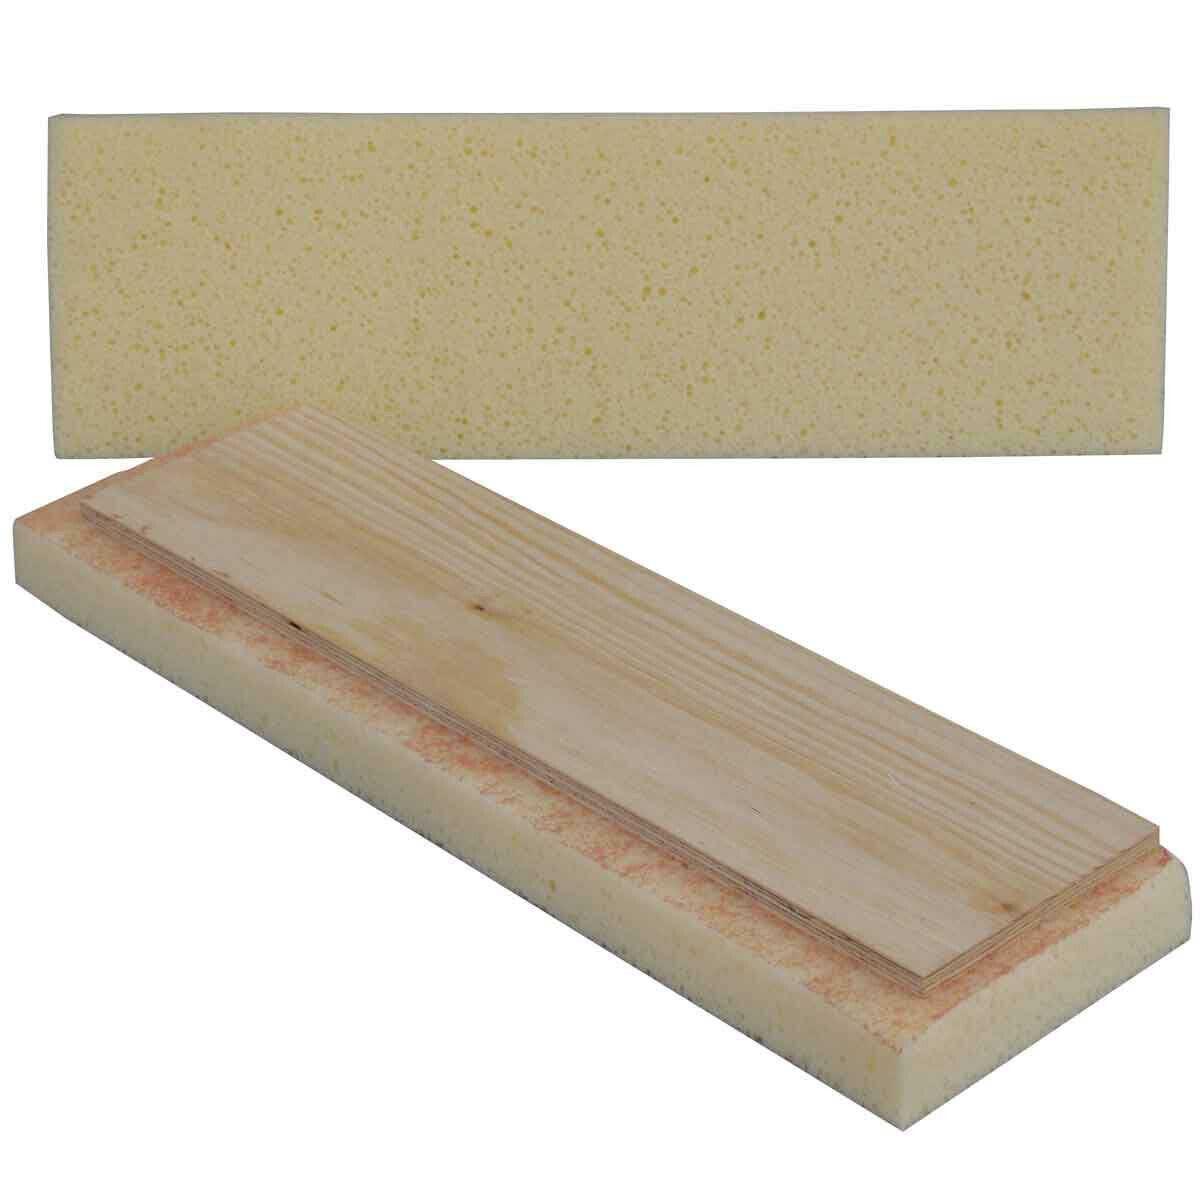 Raimondi Yellow Floor Grout Sponge